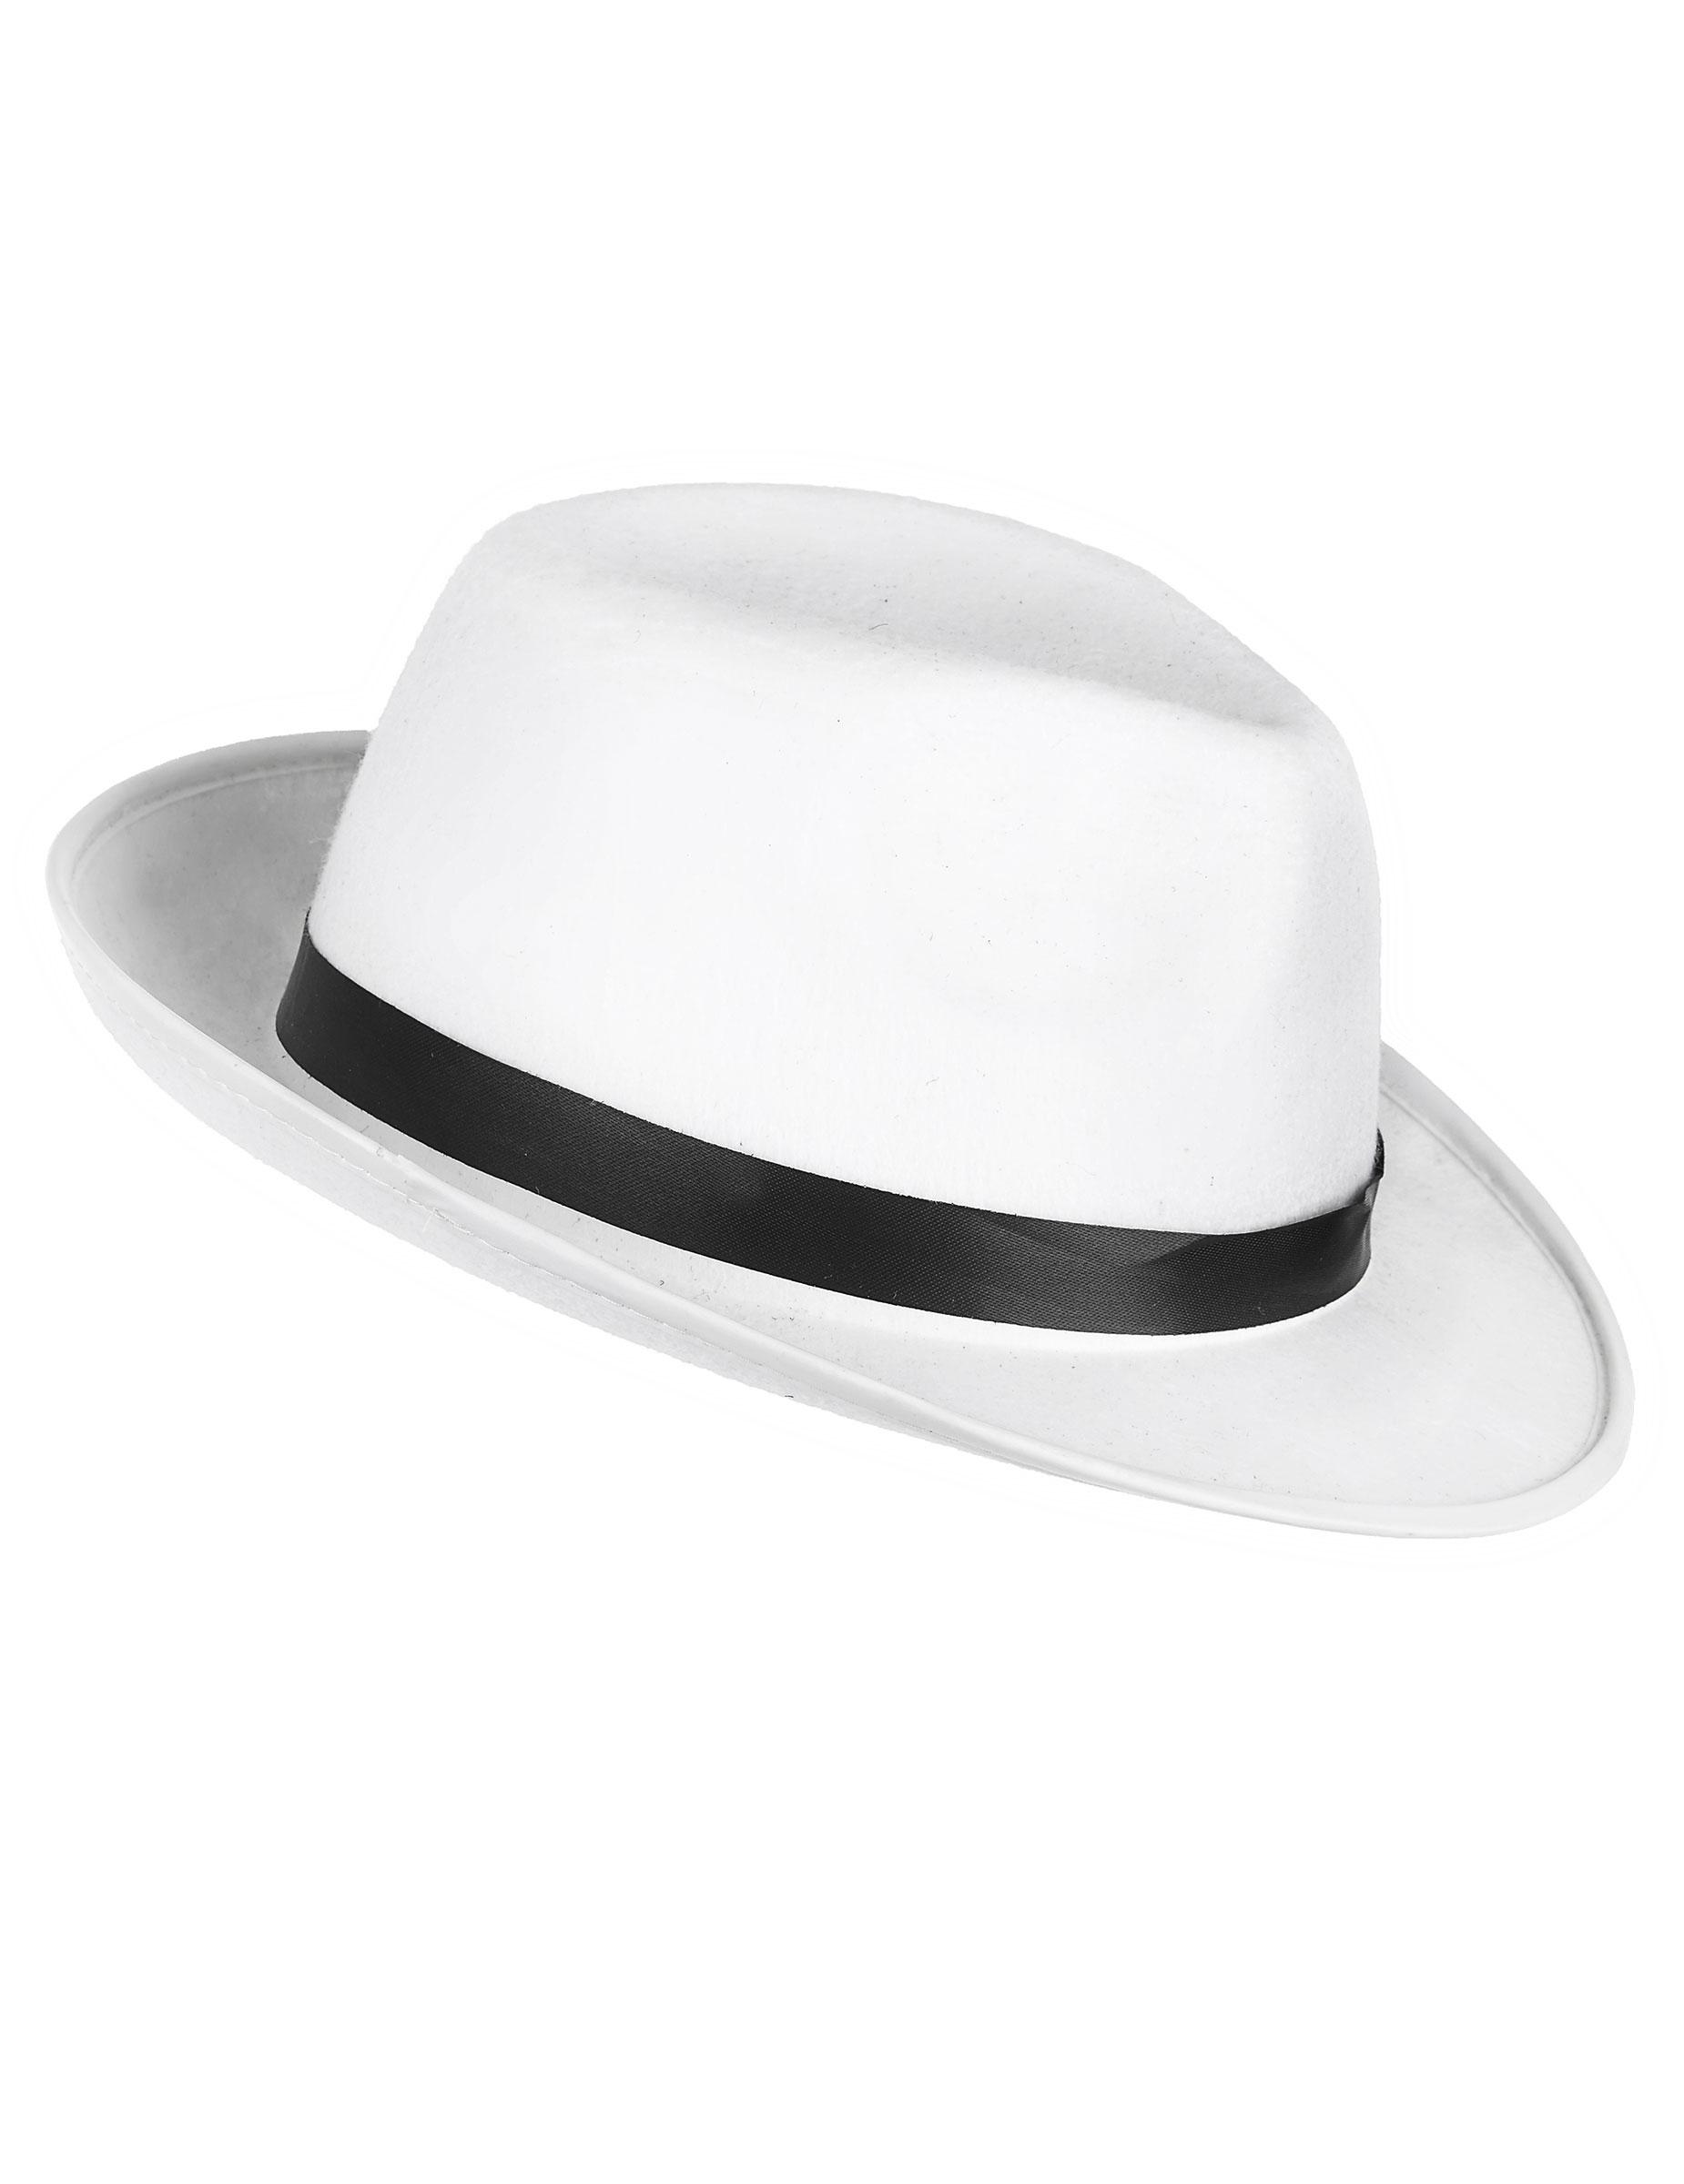 131f3d9be4cc2 Chapéu de gangster branco adulto  Chapéus